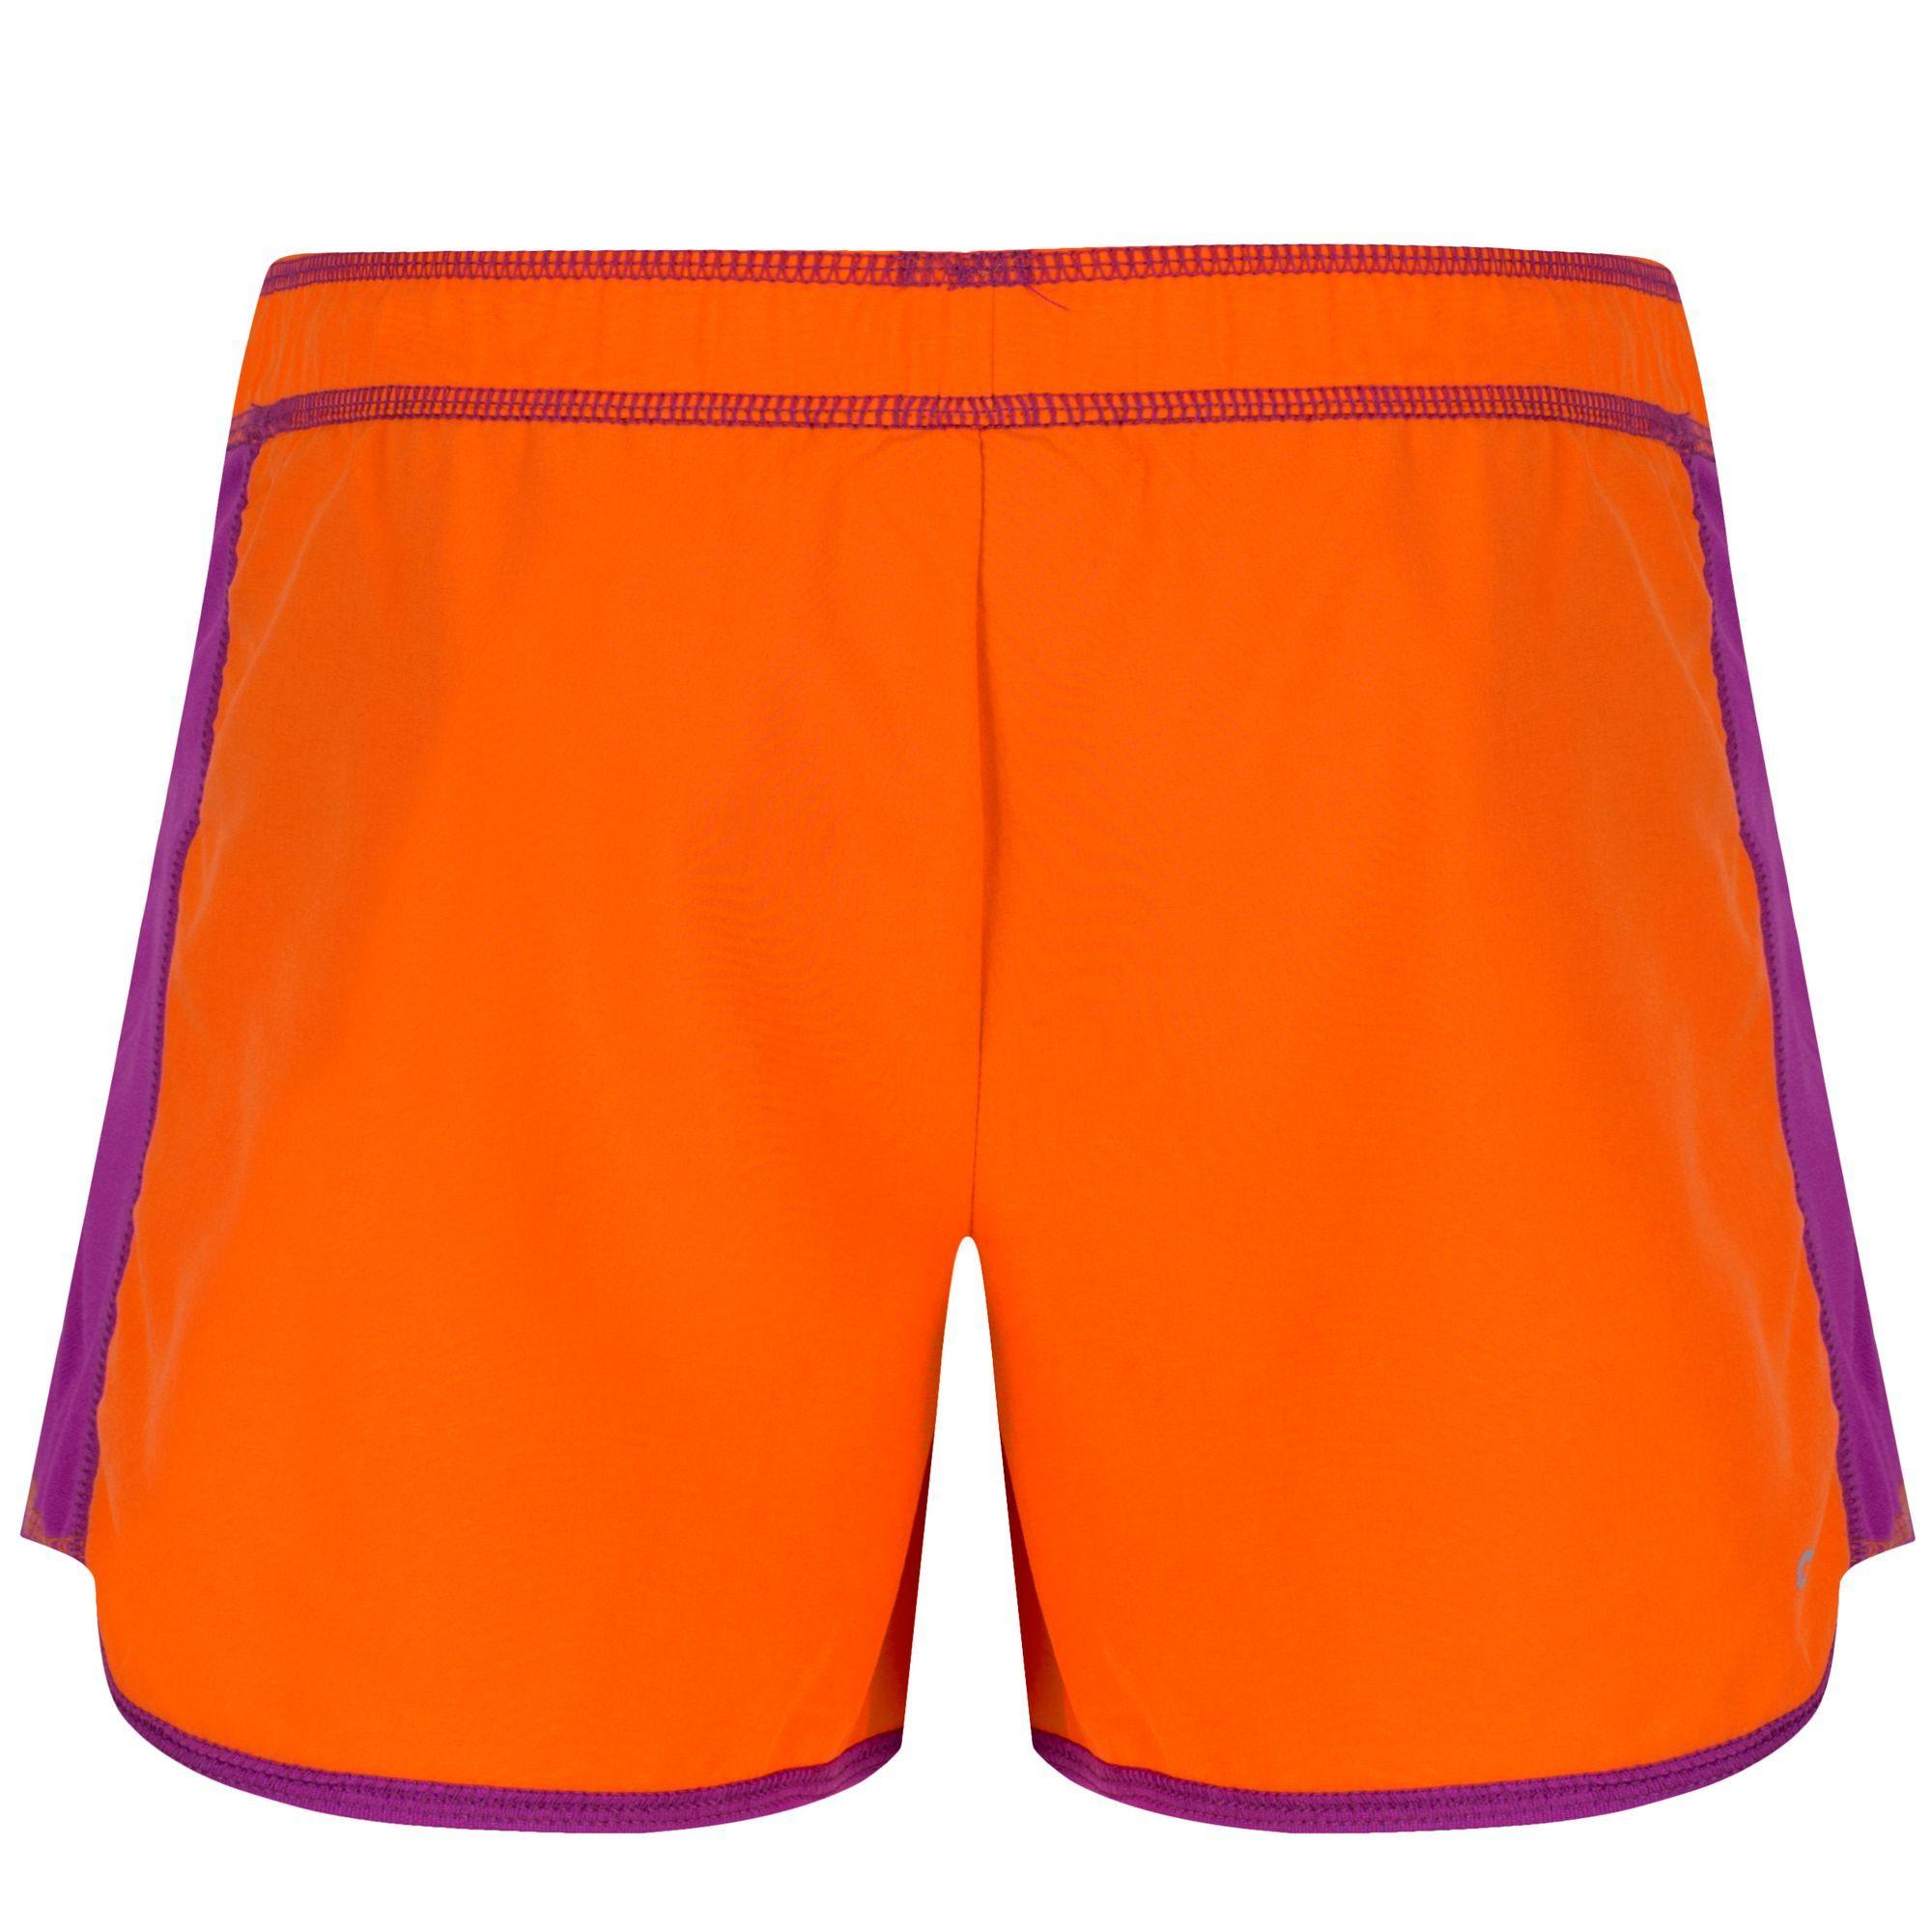 Regatta Great Outdoors Childrens/Girls Limber Quick Drying Shorts